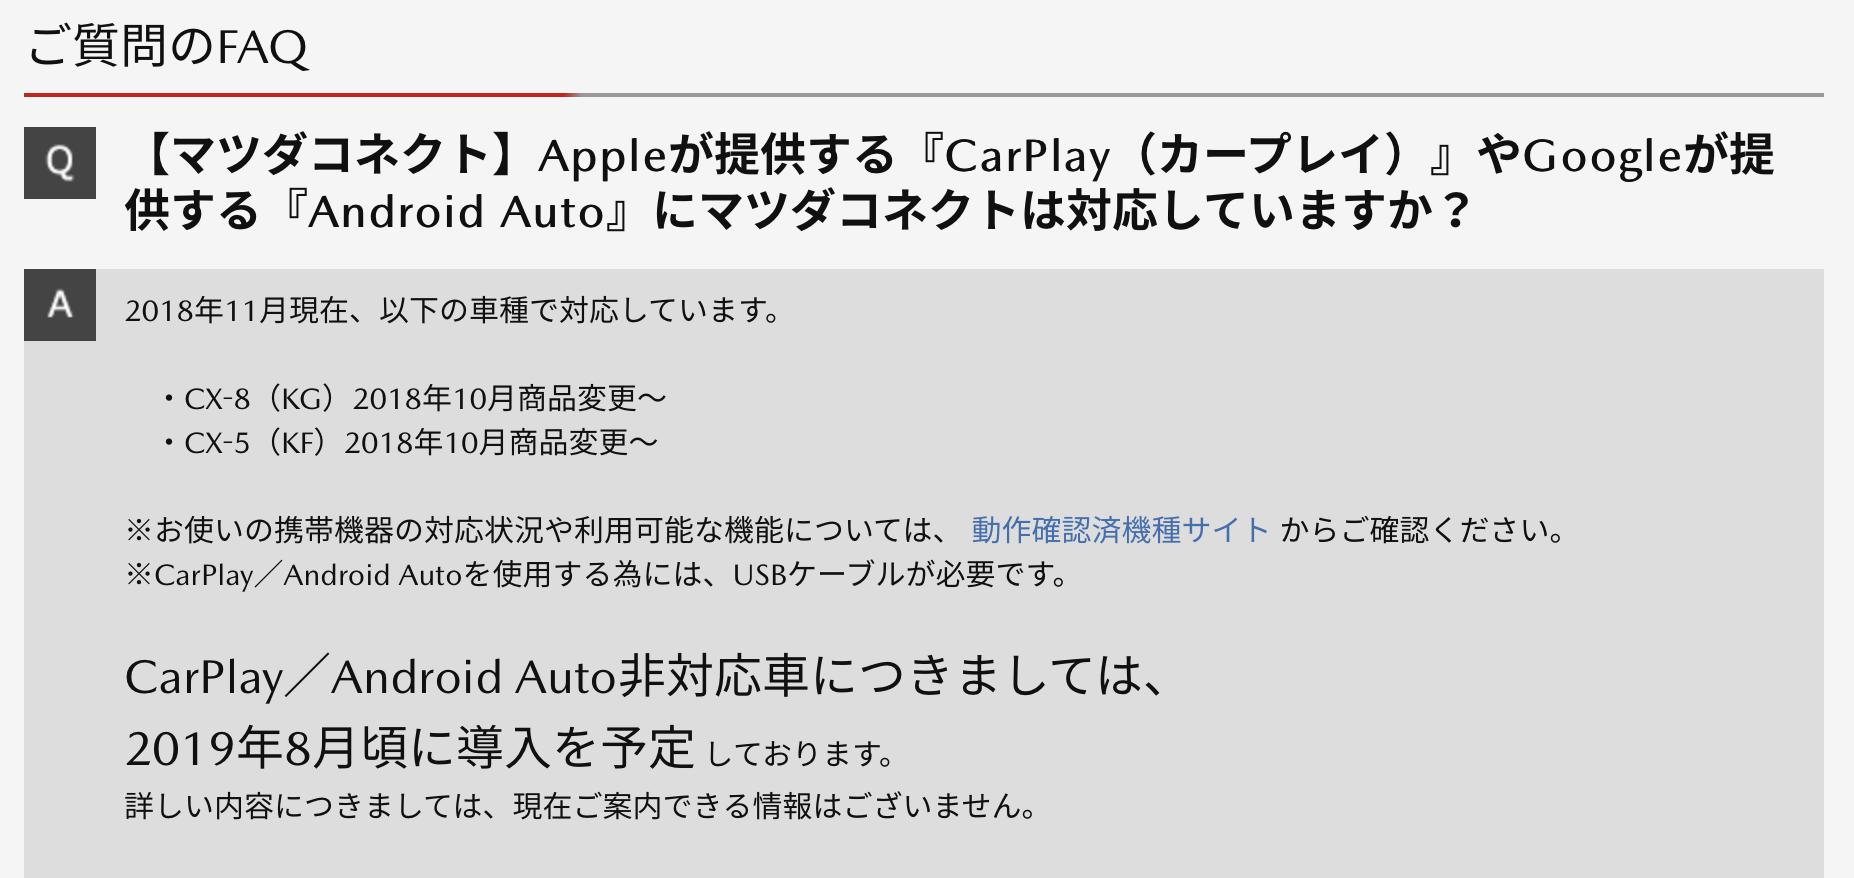 CarPlay/Android Auto非対応車につきましては、2019年8月頃に導入を予定 日本マツダ mazda_carplay